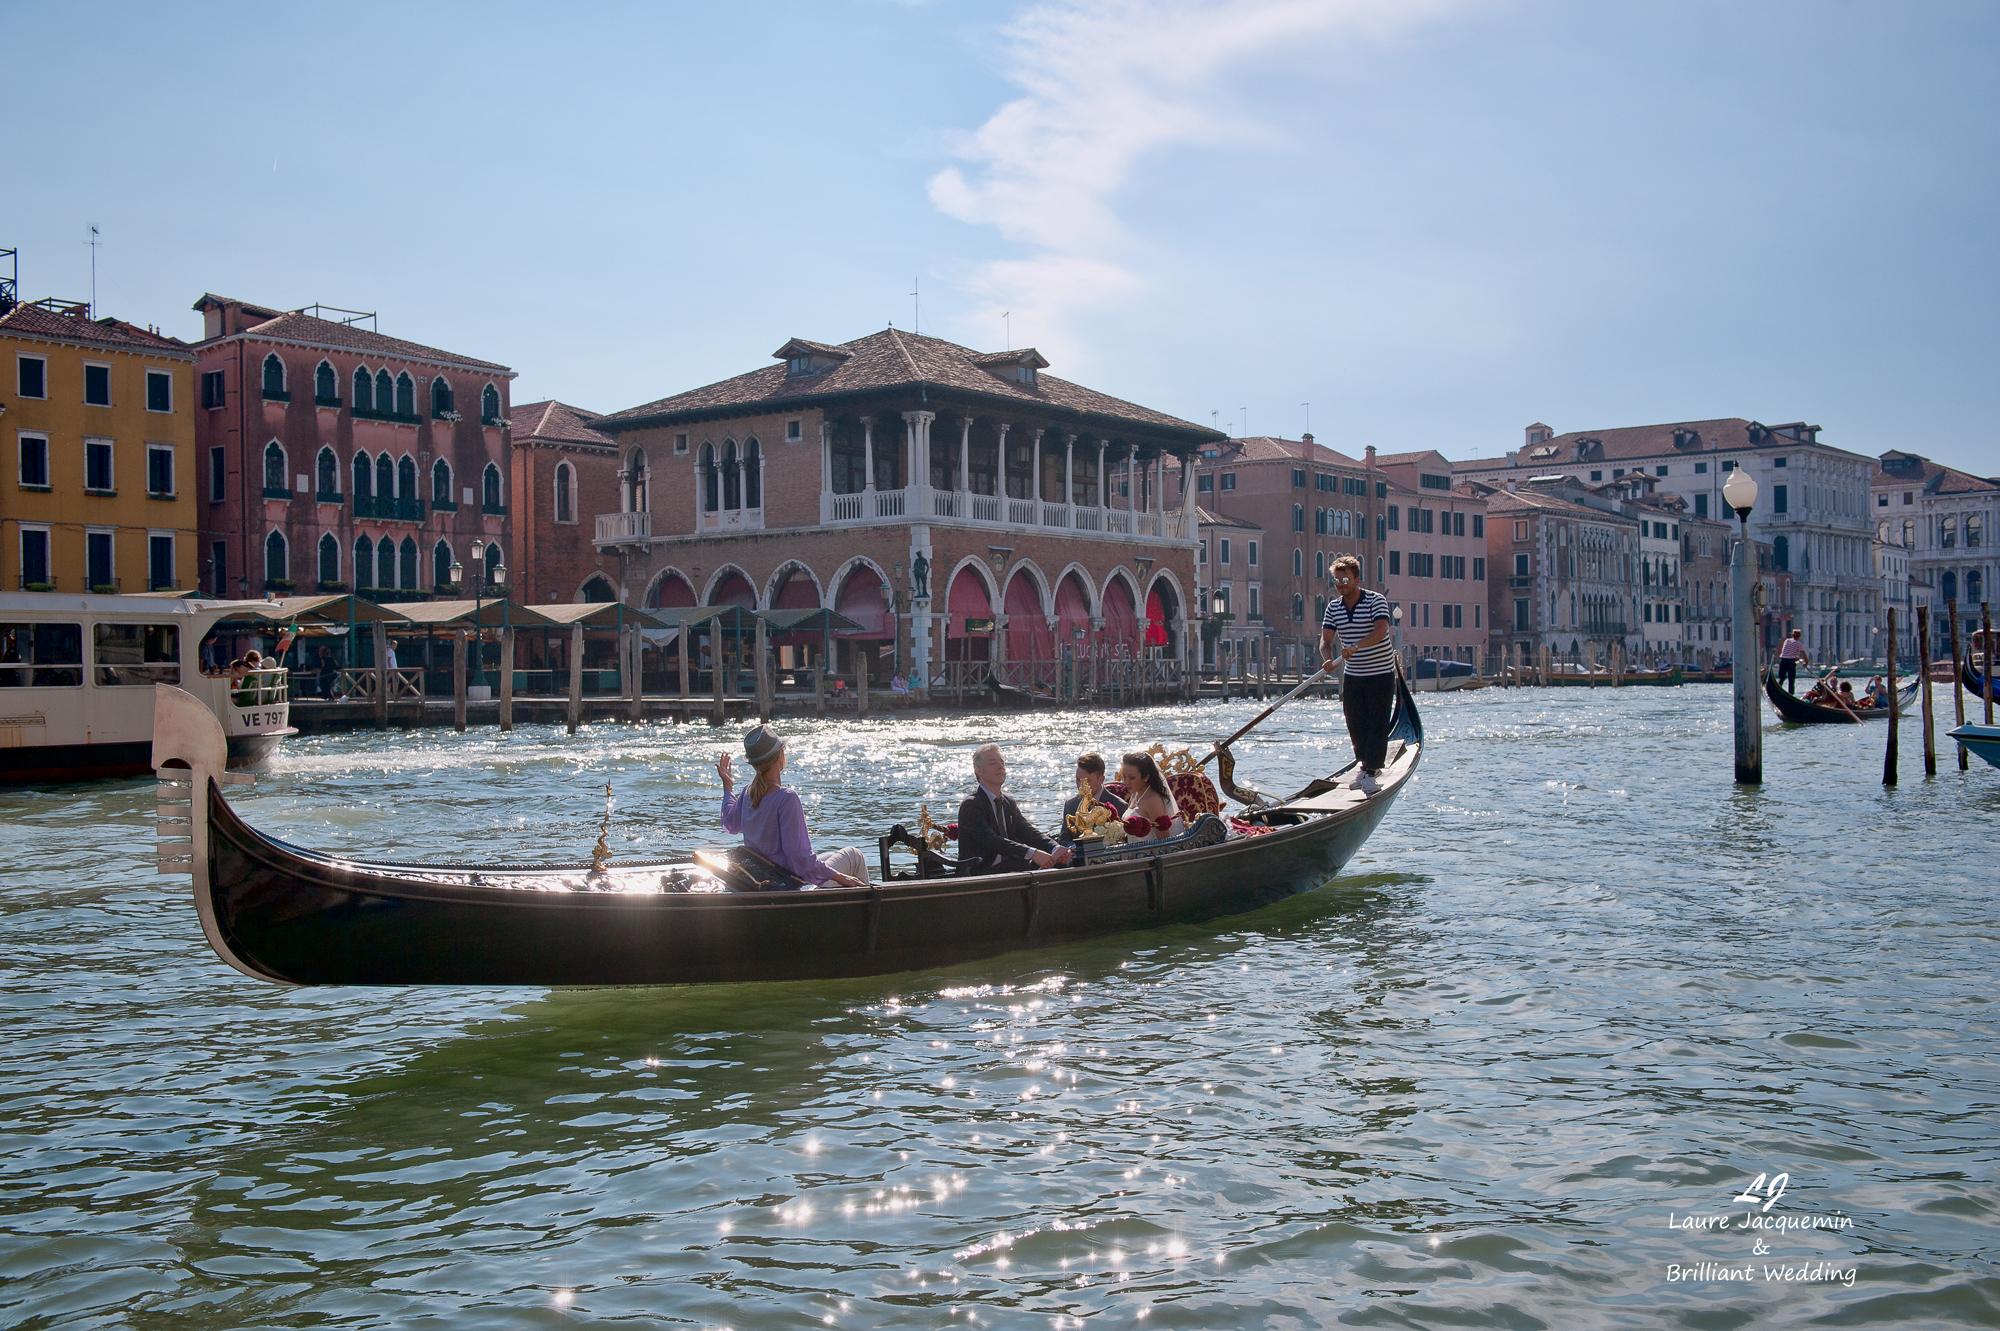 Venice Simbolic Wedding gondola venice Italy laure jacquemin photography (21) copia